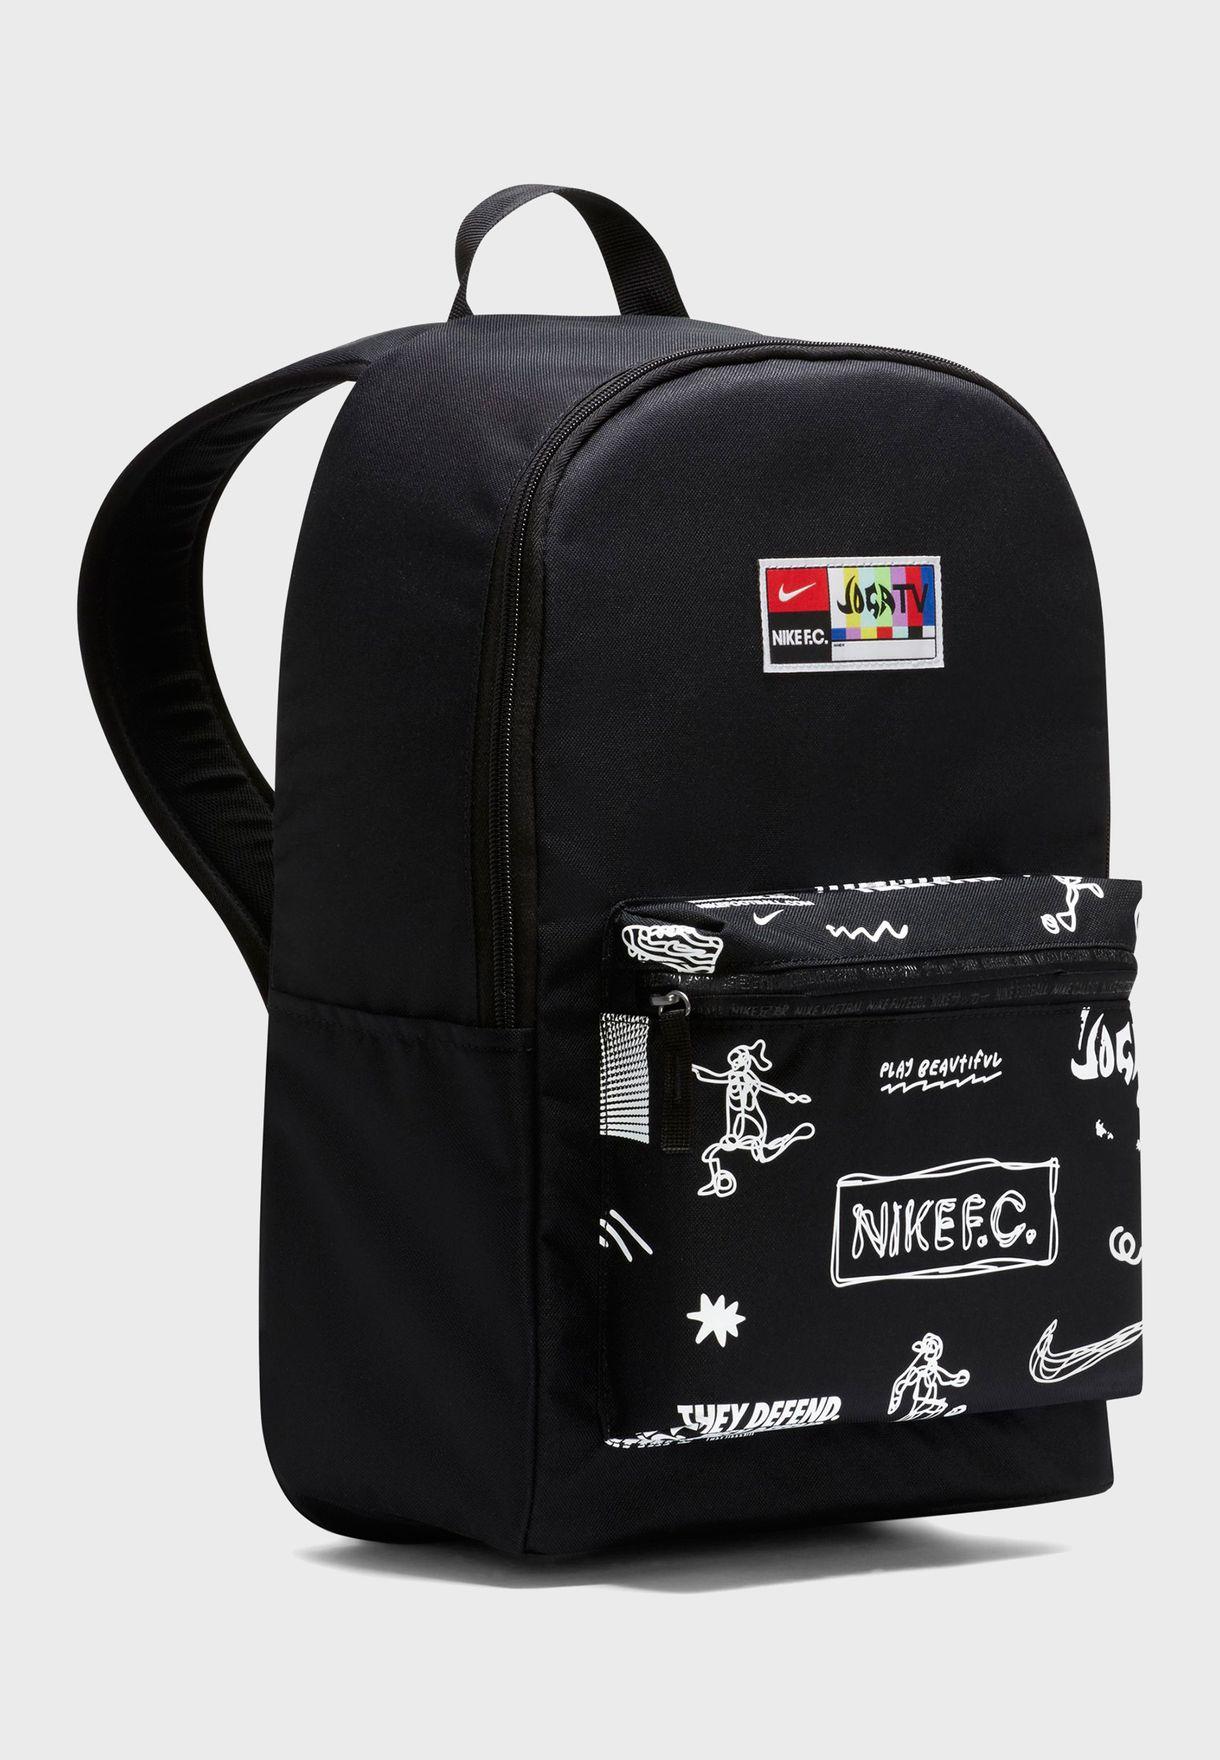 F.C. Backpack